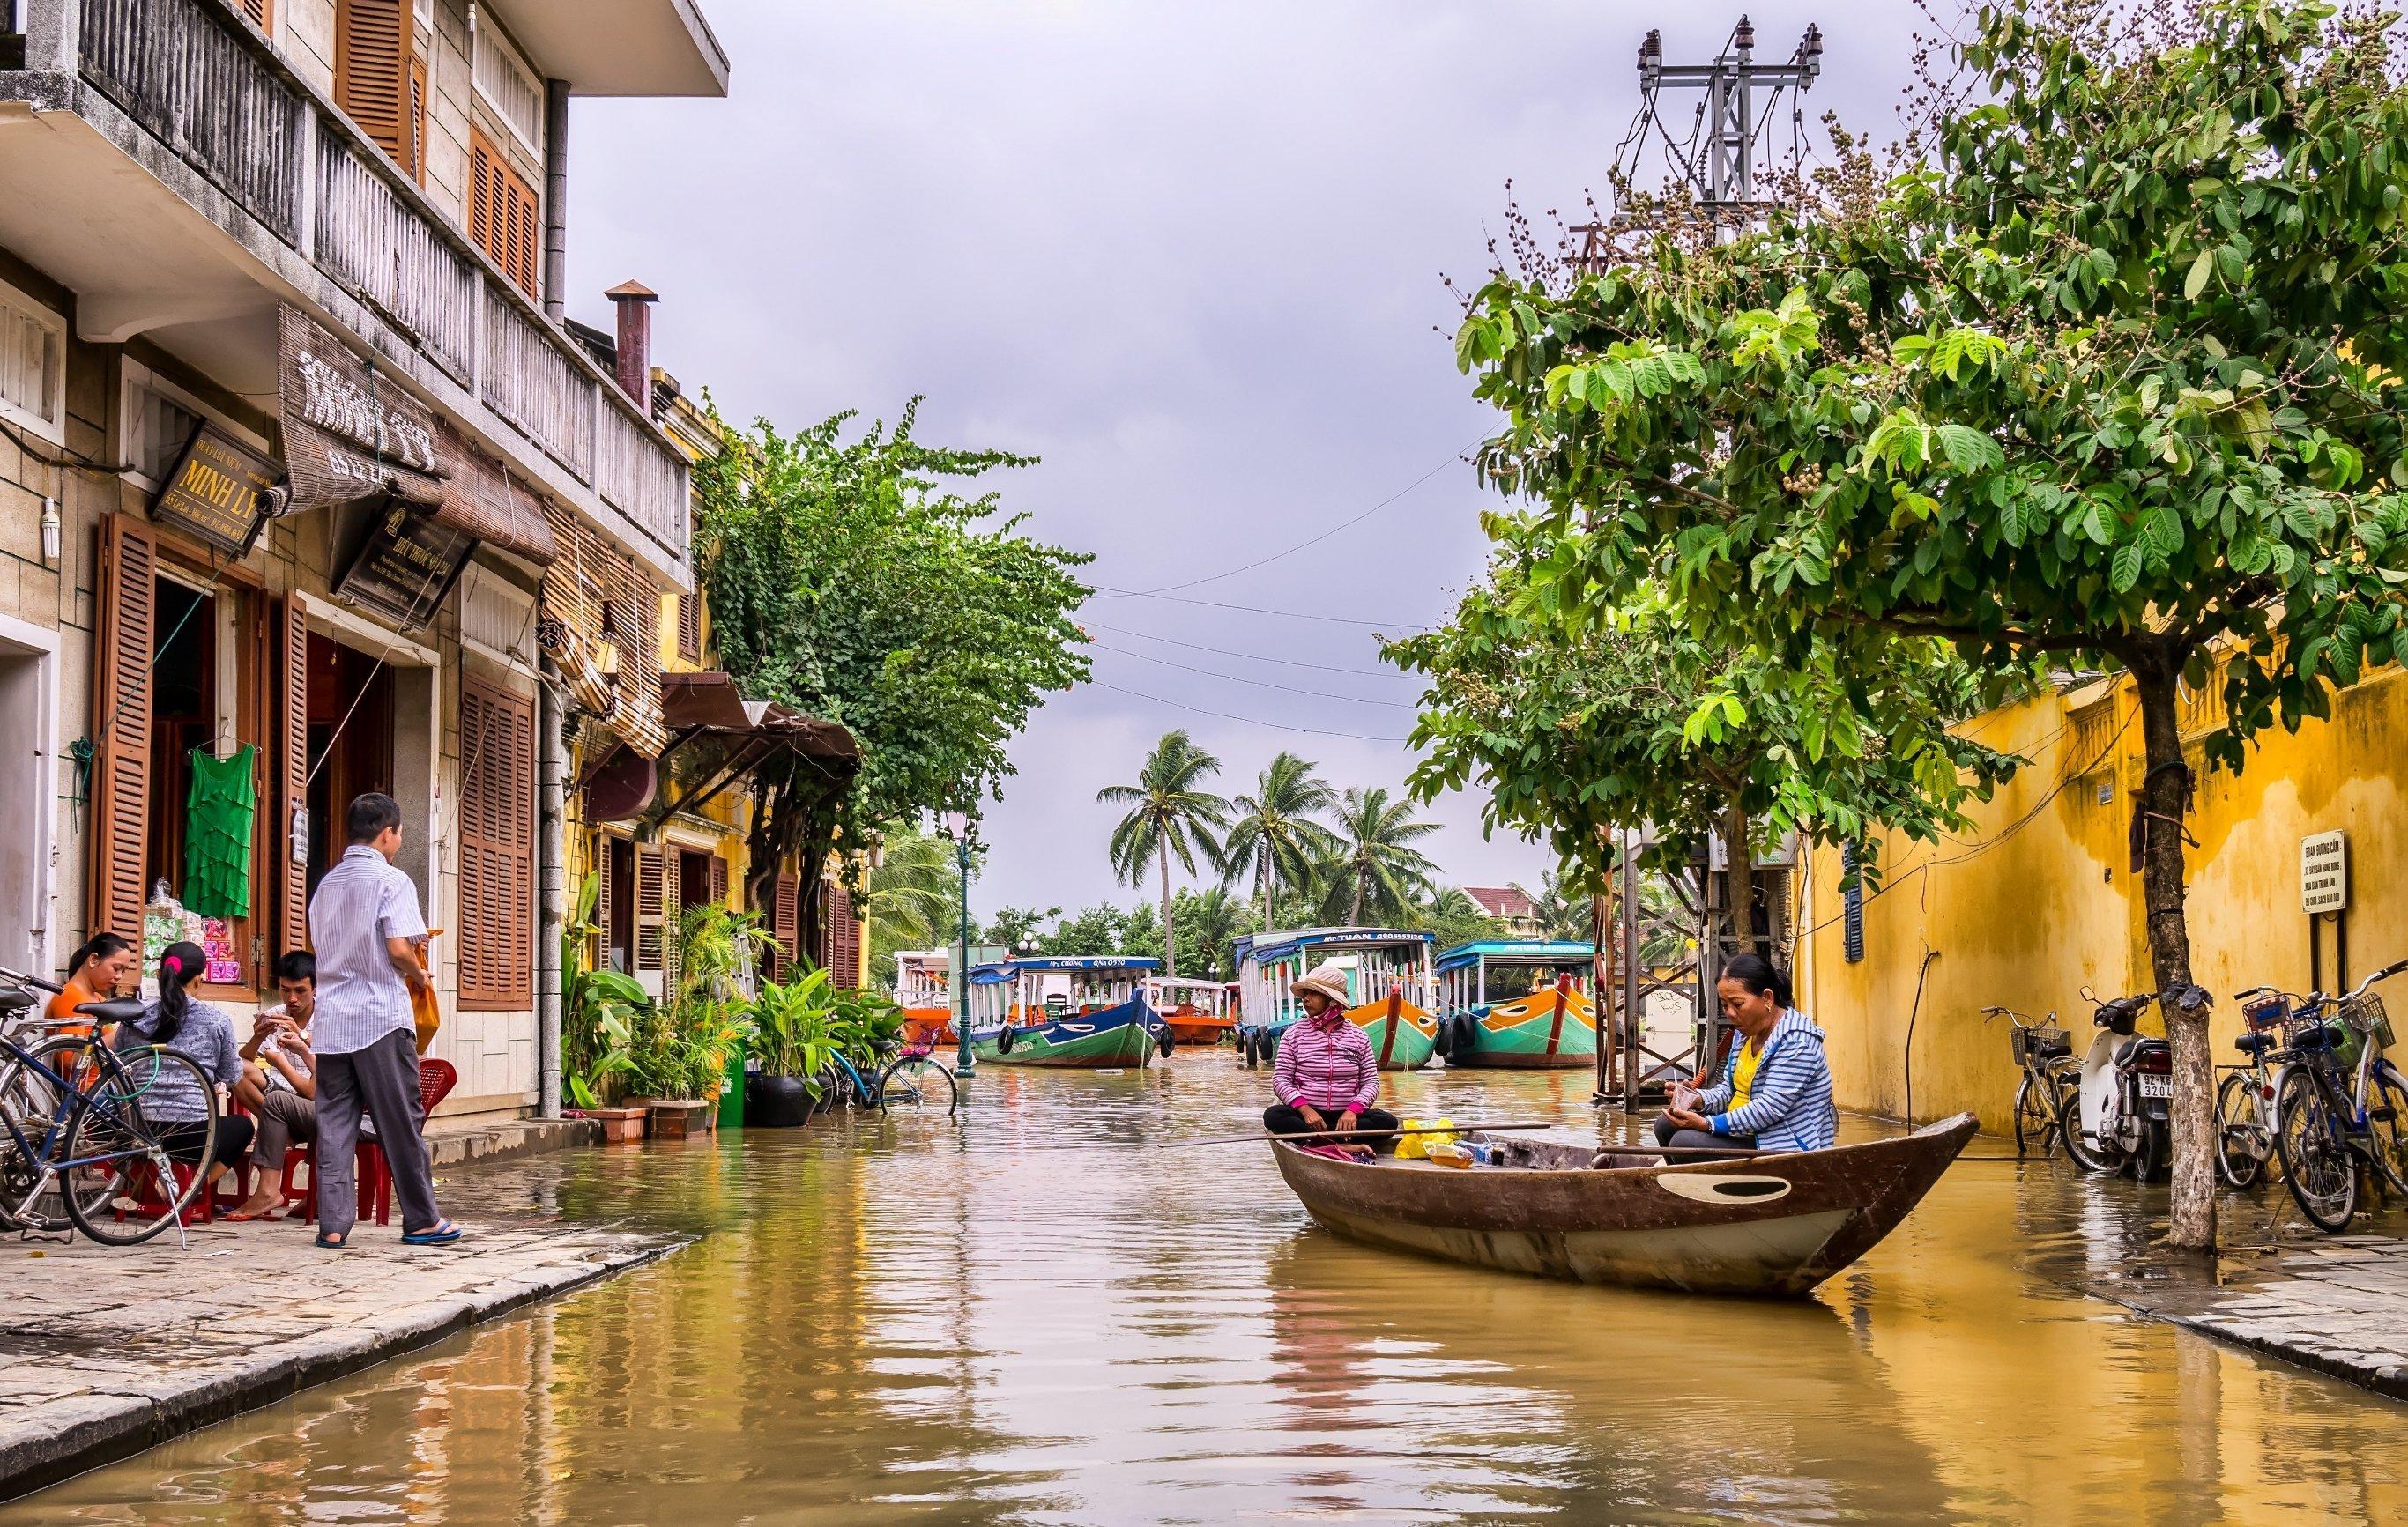 4-Day Hoi An Ancient Town & Beach - Vietnam Itinerary